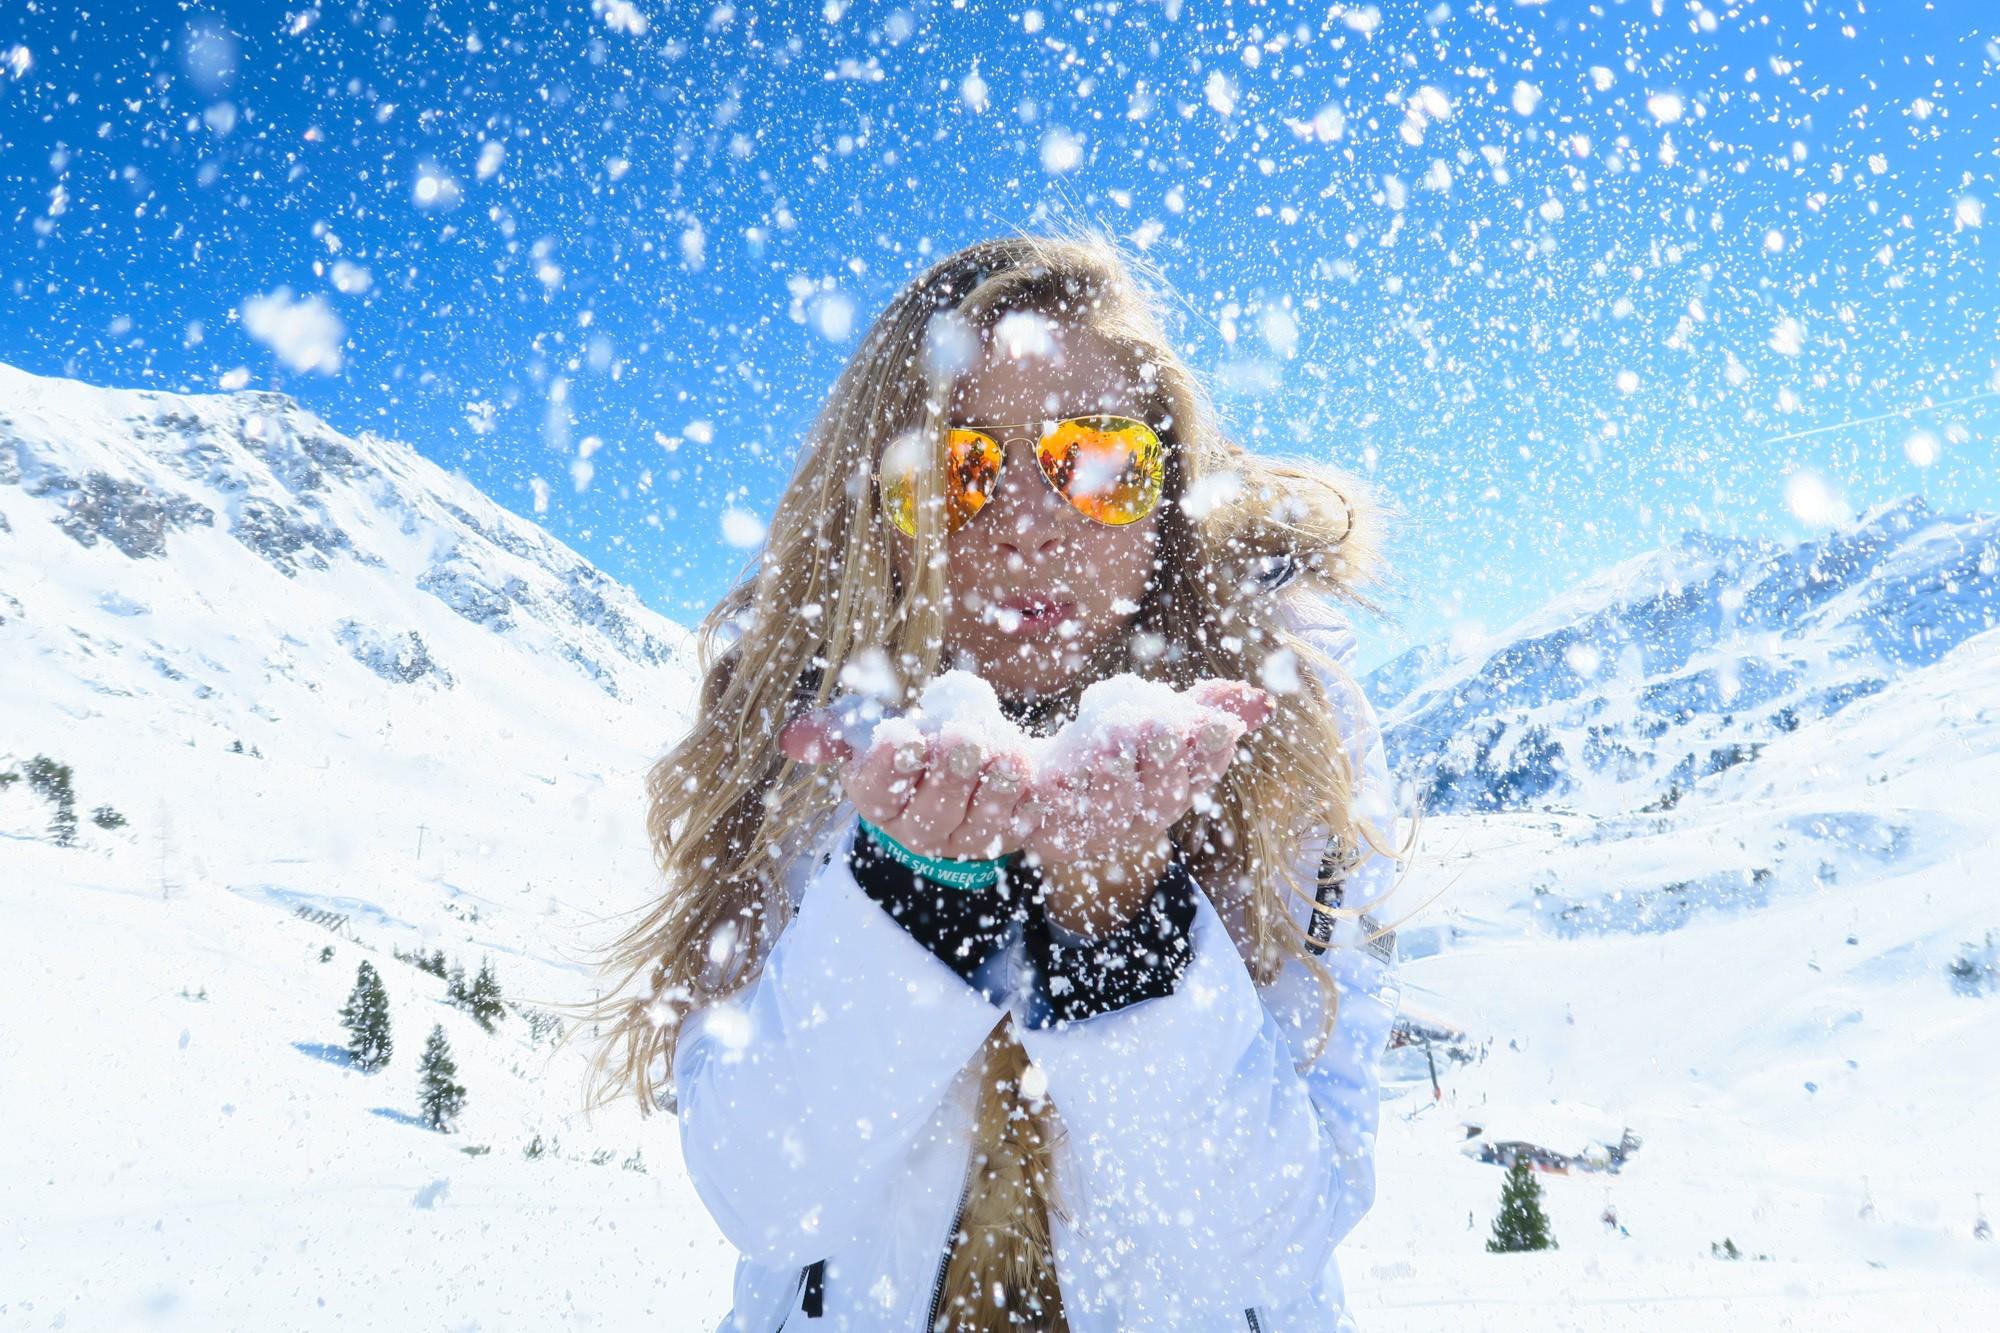 Blowing snow in Austria